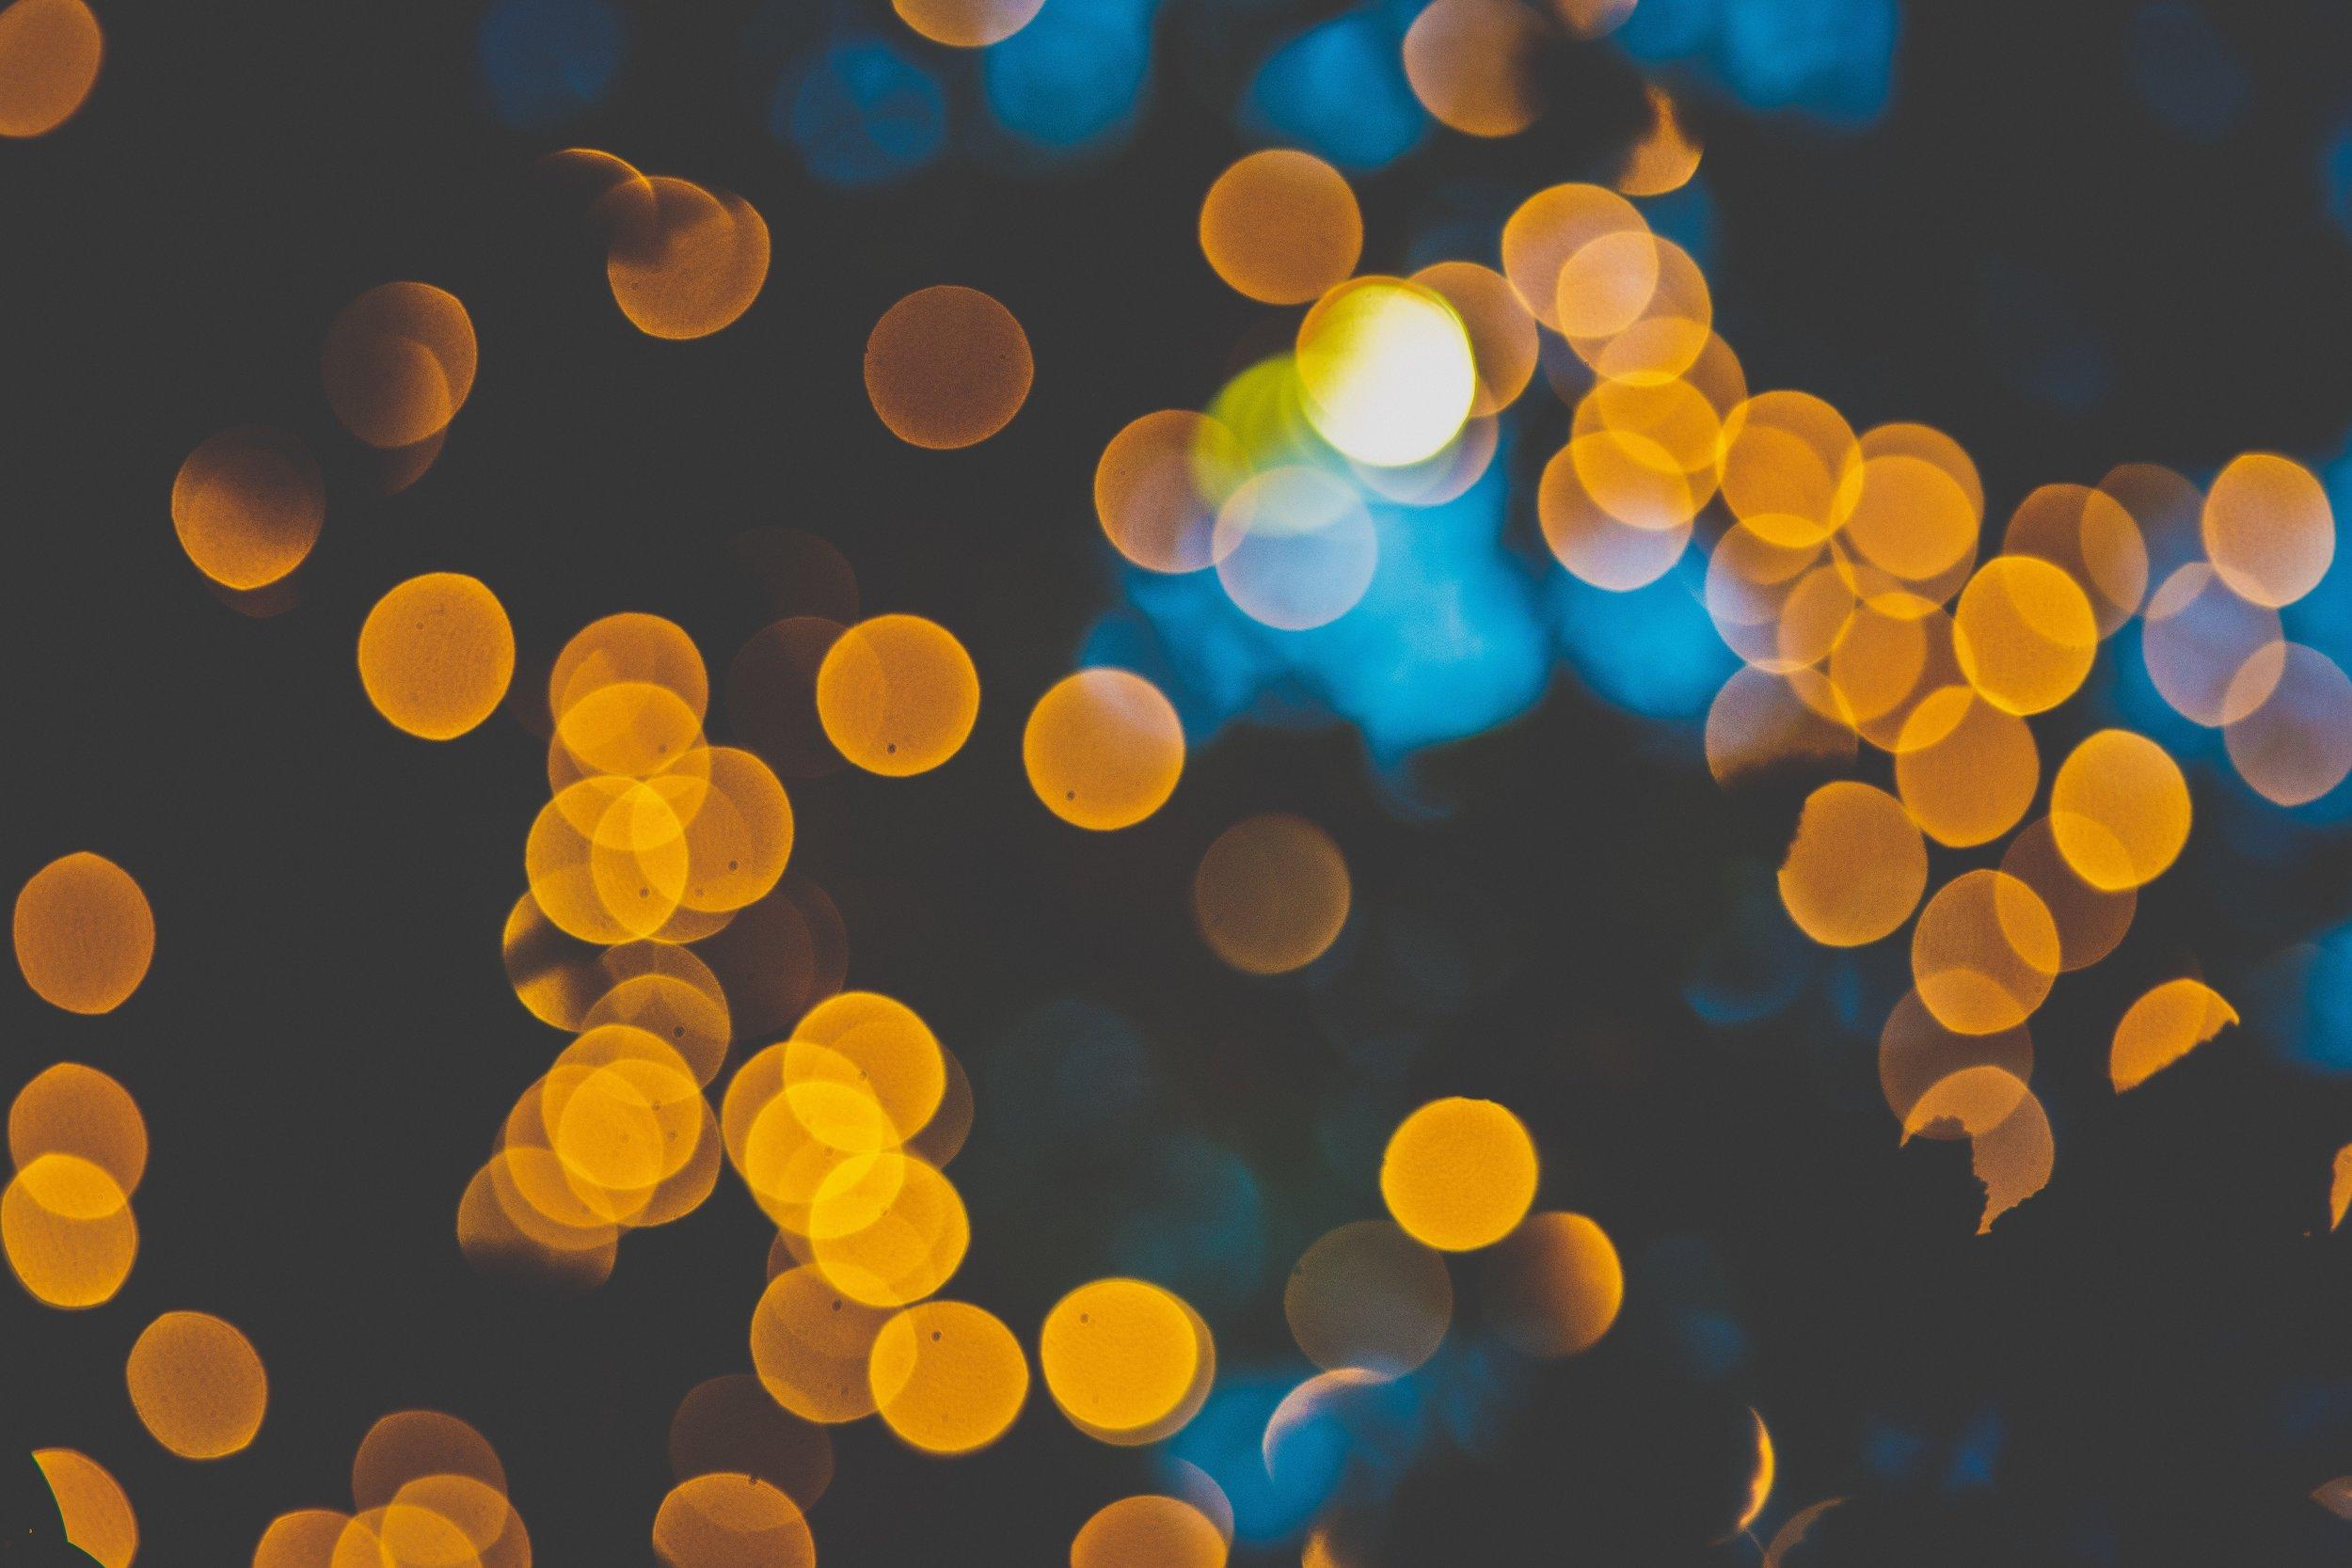 abstract-background-blur-949587.jpg